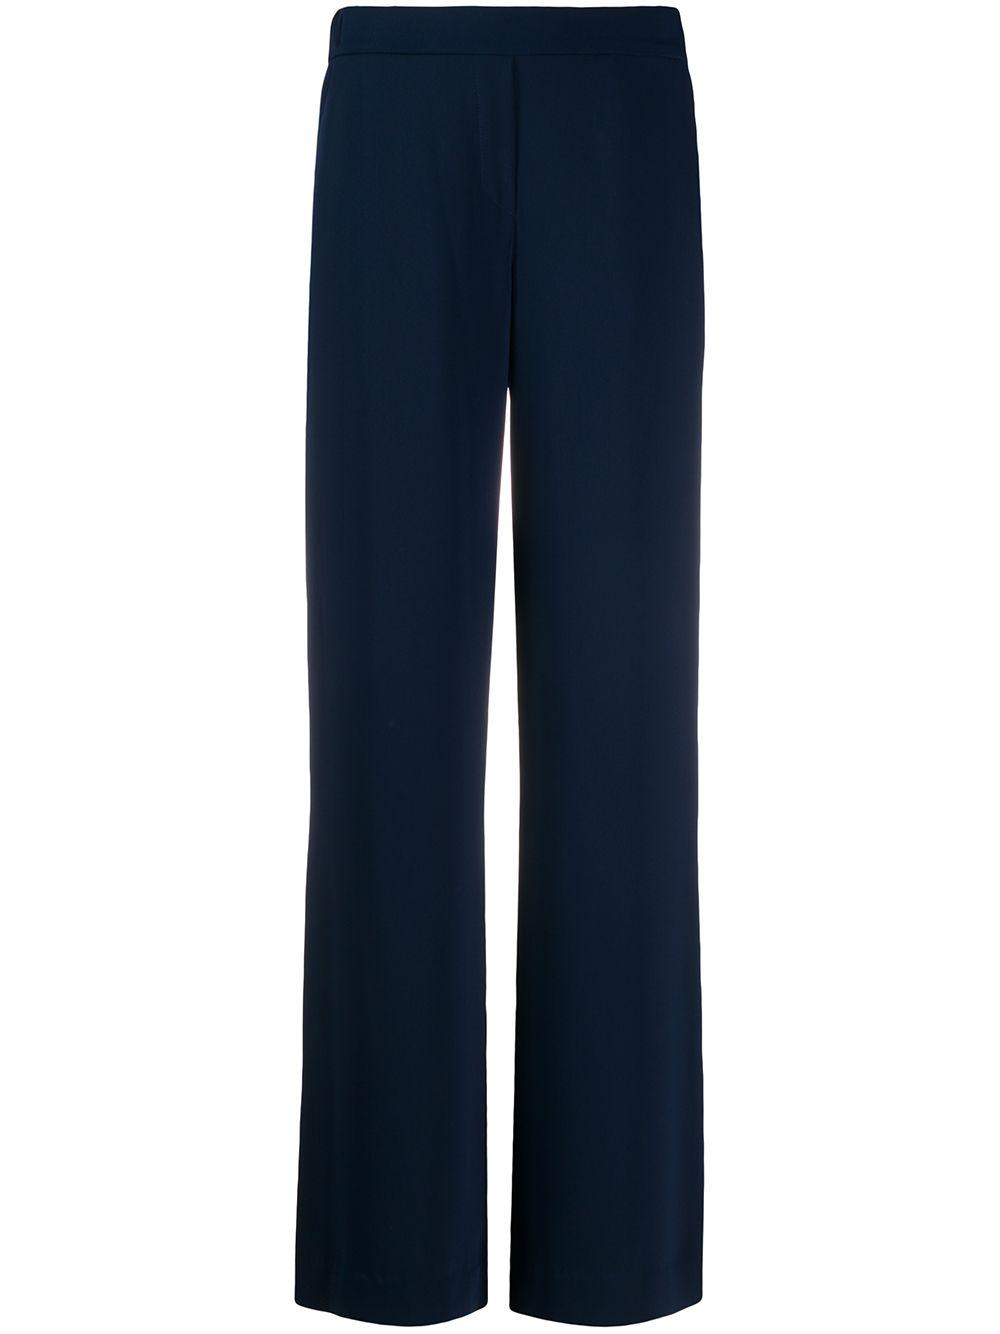 Pantaloni blu svasati con zip nascosta P.A.R.O.S.H. | Pantaloni | D230087X-PANTERS012